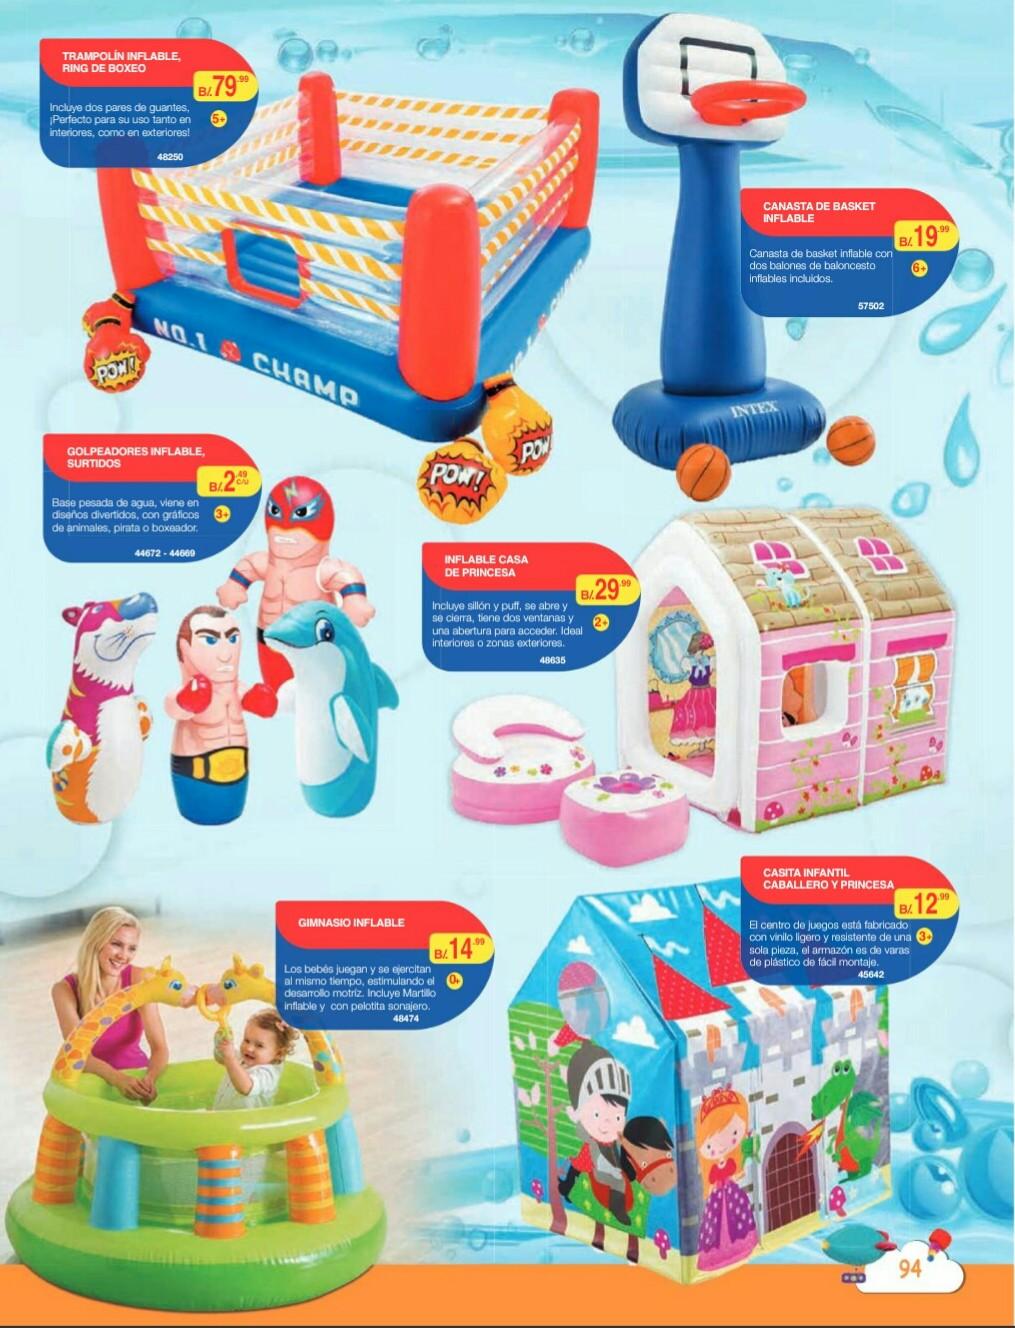 Catalogo juguetes Titan Toys 2018 p95